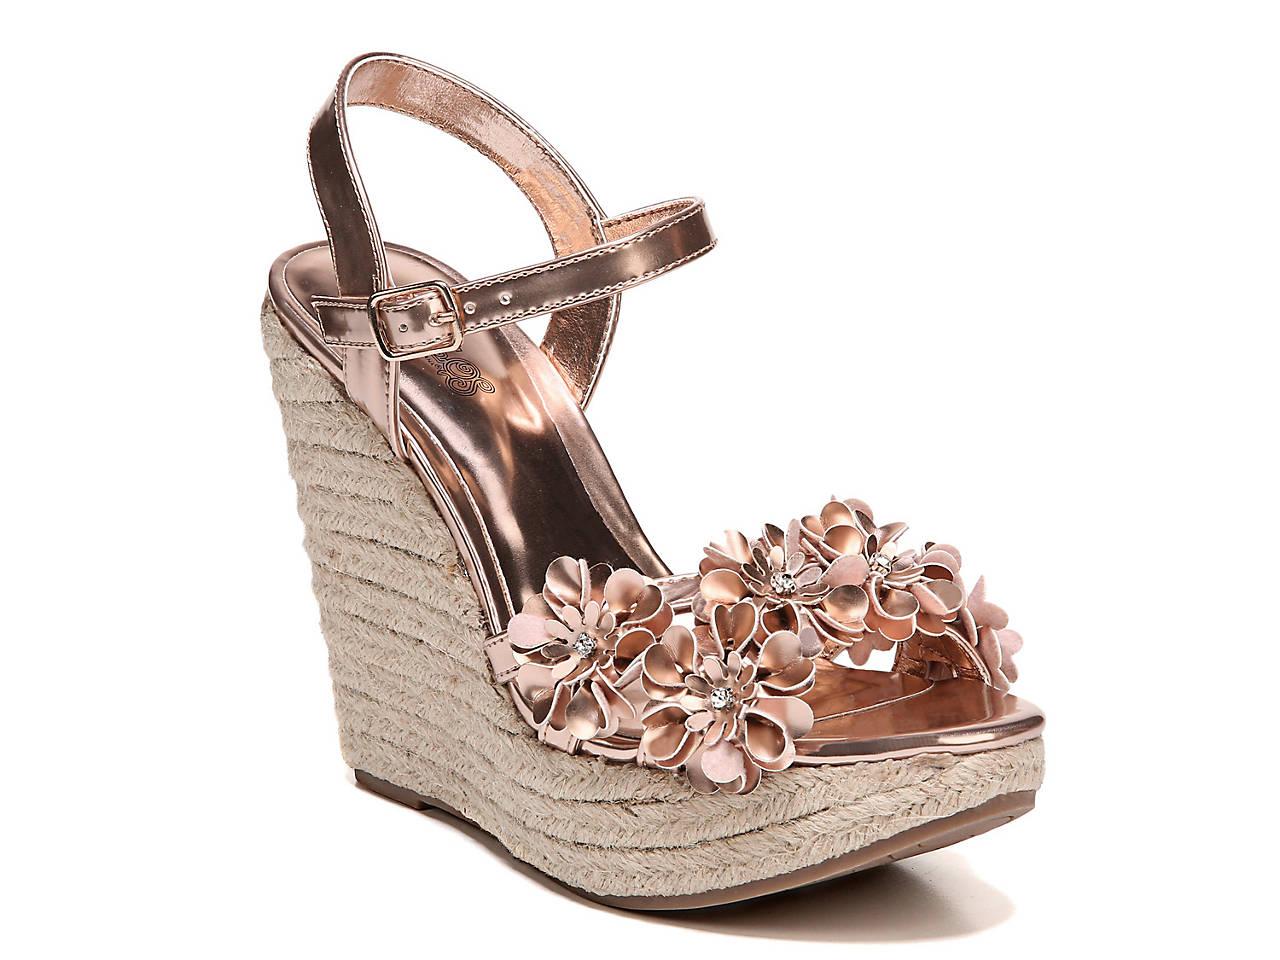 c3b667cc6ca Carlos by Carlos Santana Belinda Wedge Sandal Men s Shoes